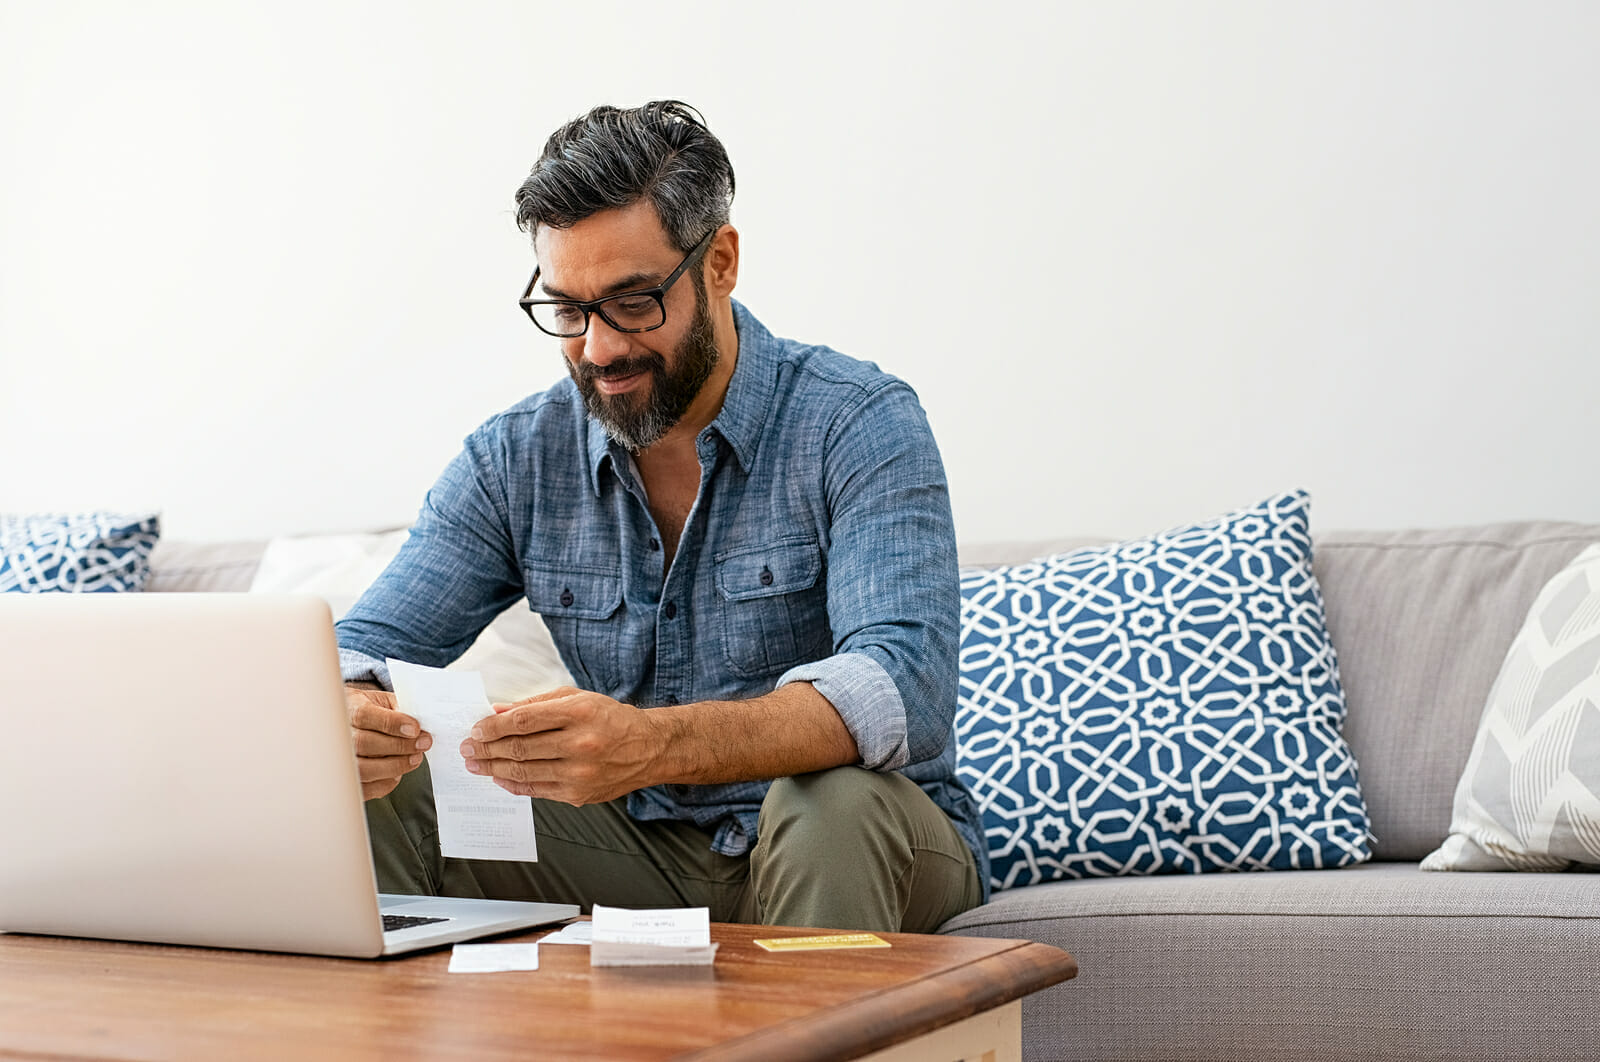 Man-On-Computer-Glasses